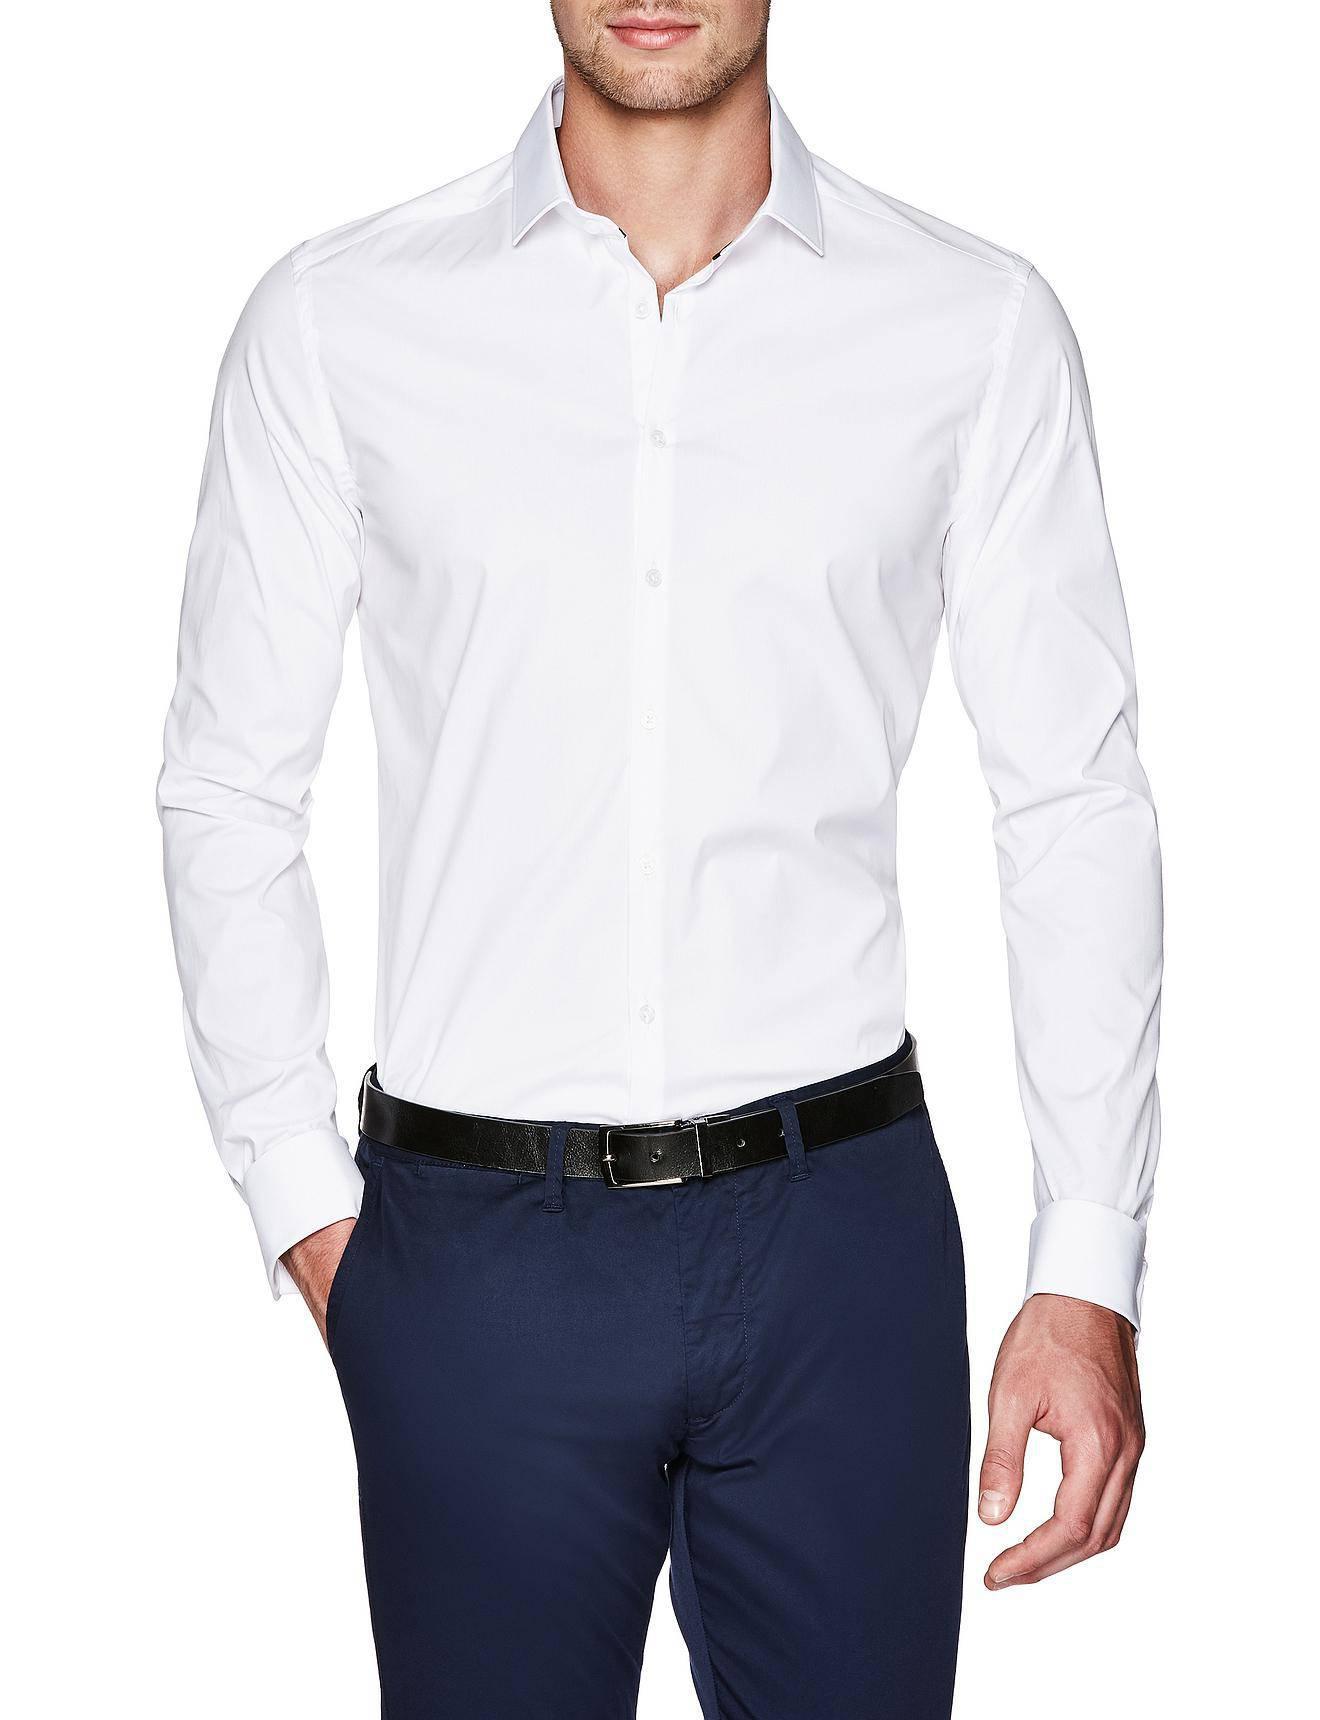 Politix Garreth Tapered Fit Dress Shirt In White For Men Lyst